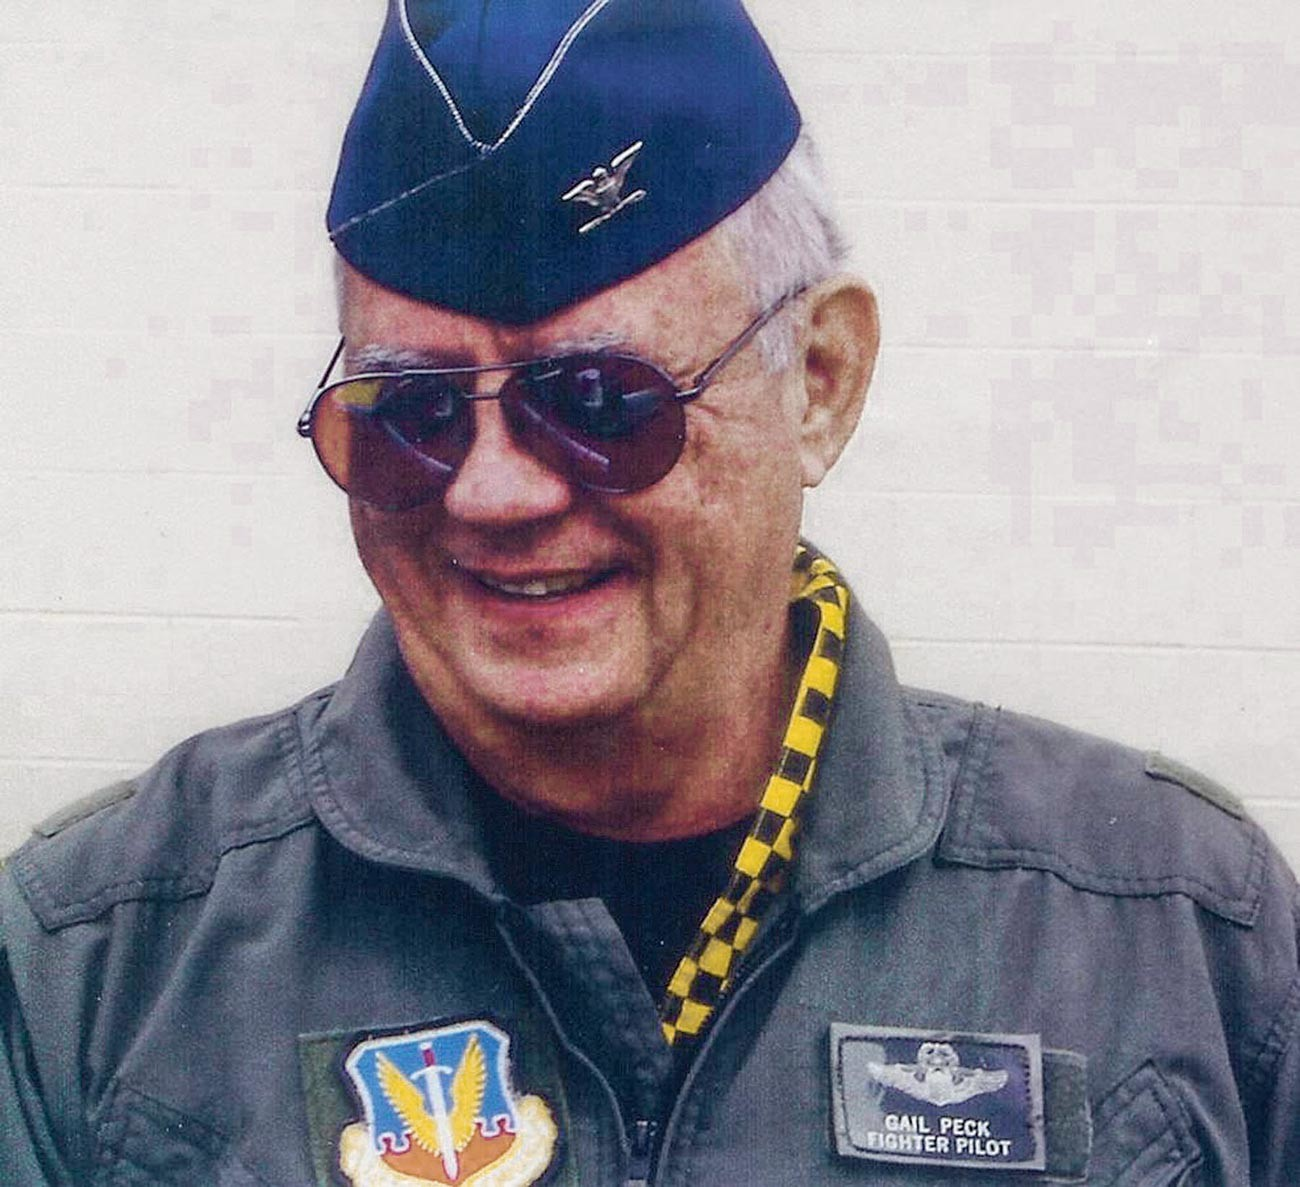 Coronel Gail Peck